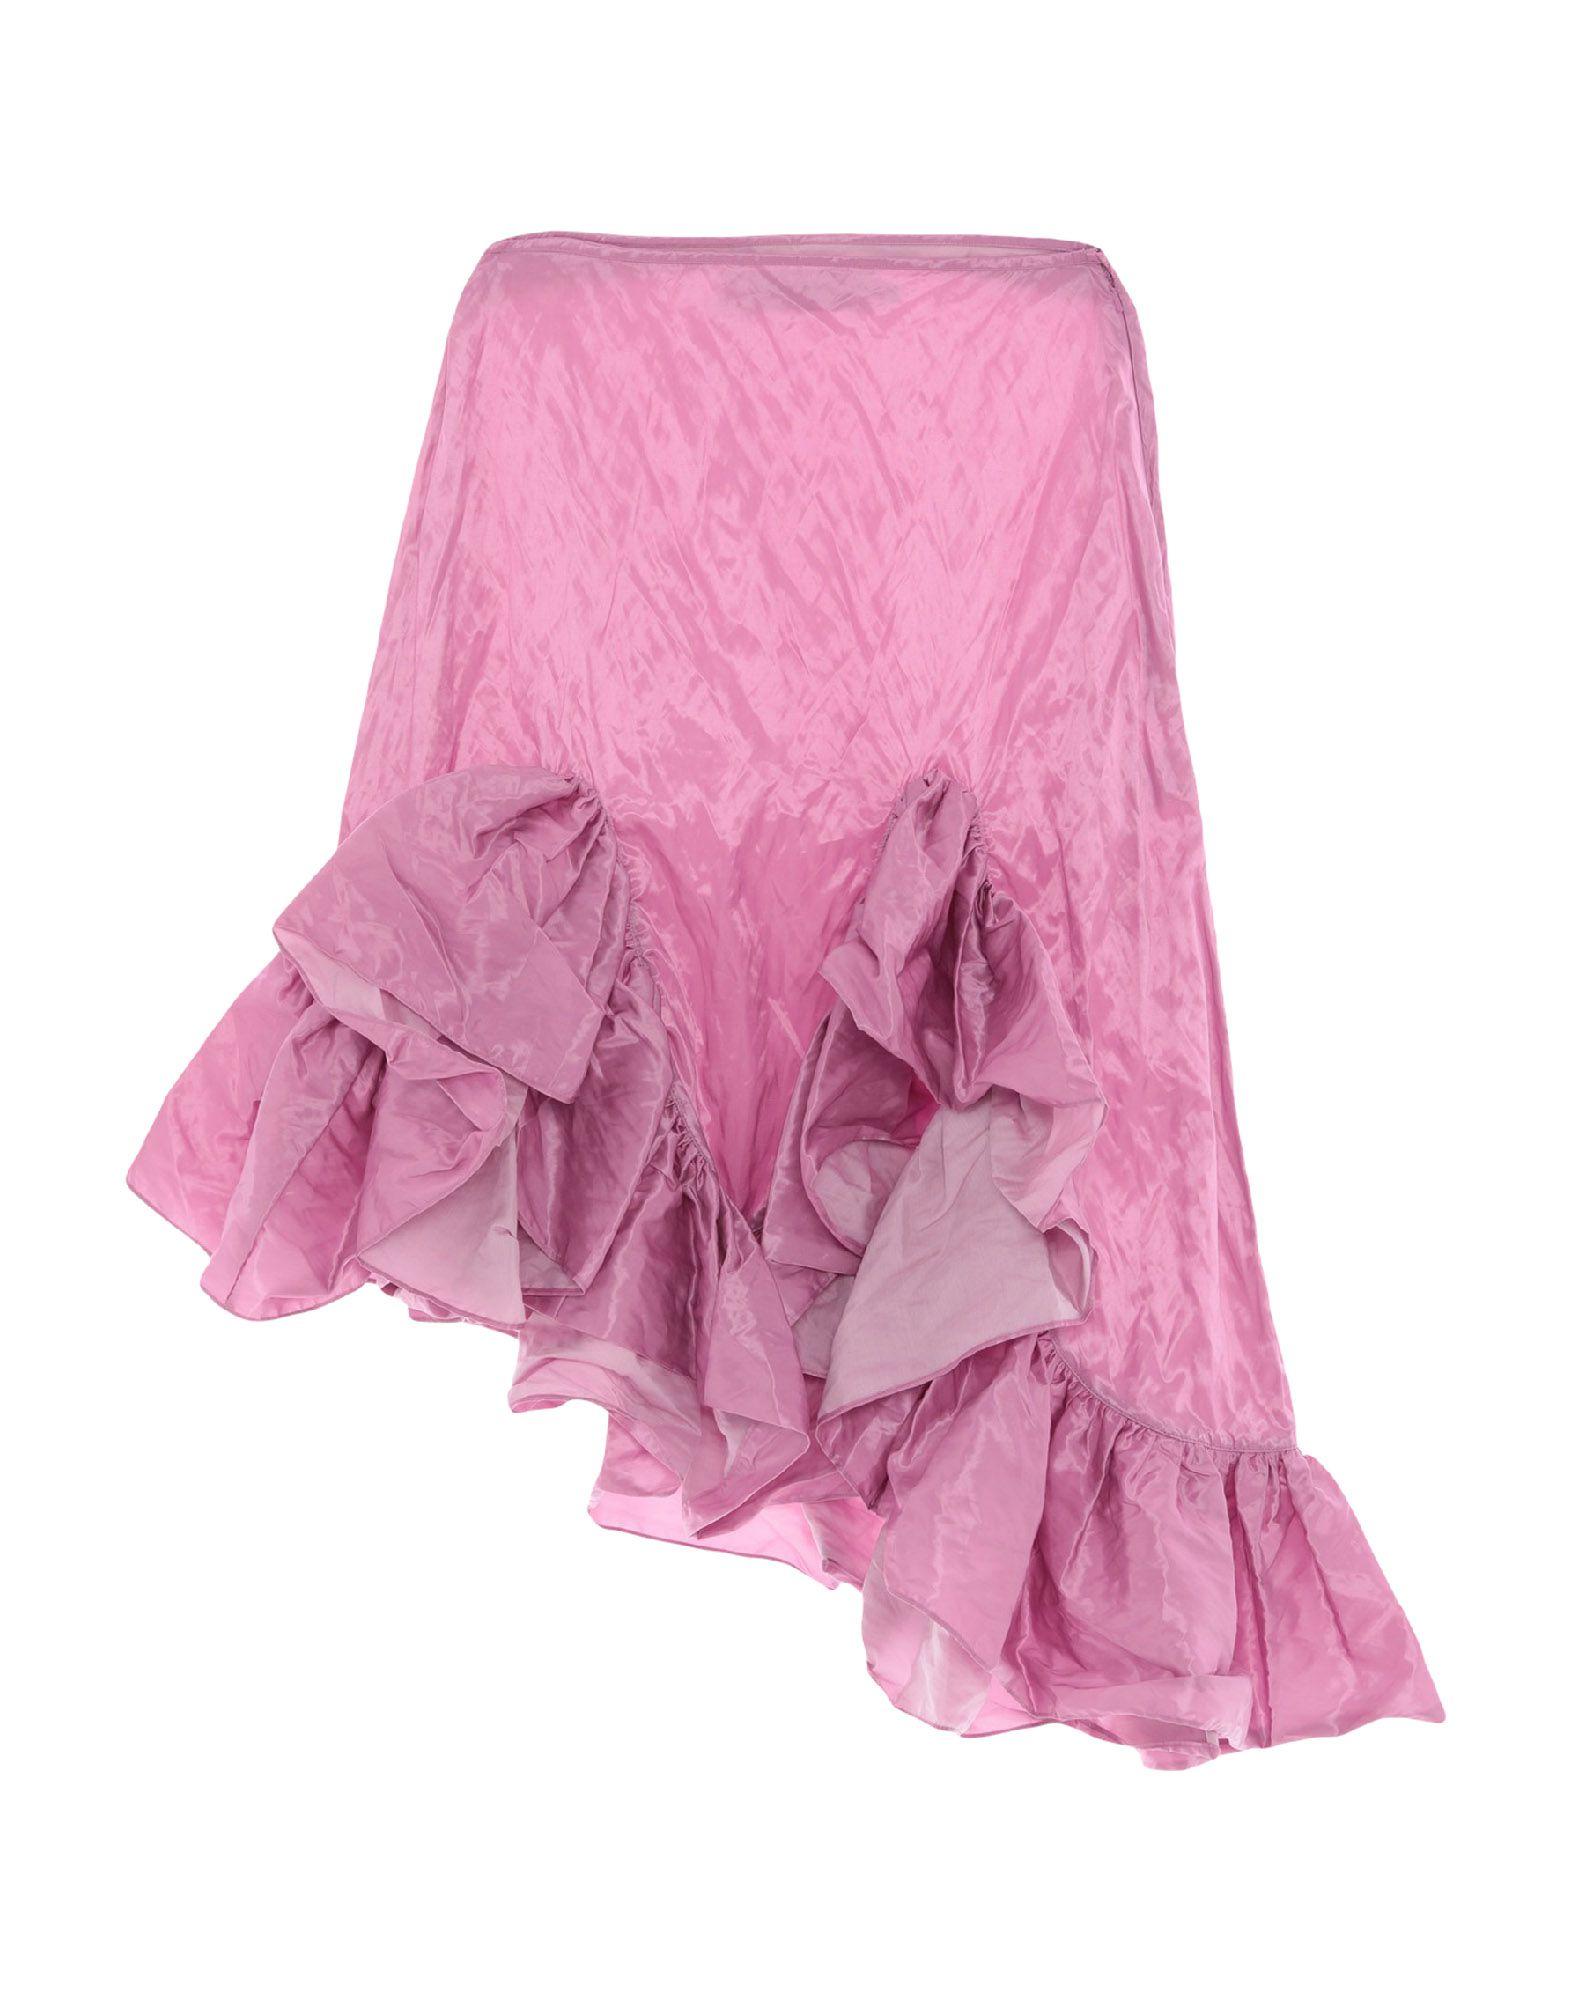 Фото - MARQUES' ALMEIDA Юбка длиной 3/4 marques almeida джинсовая юбка